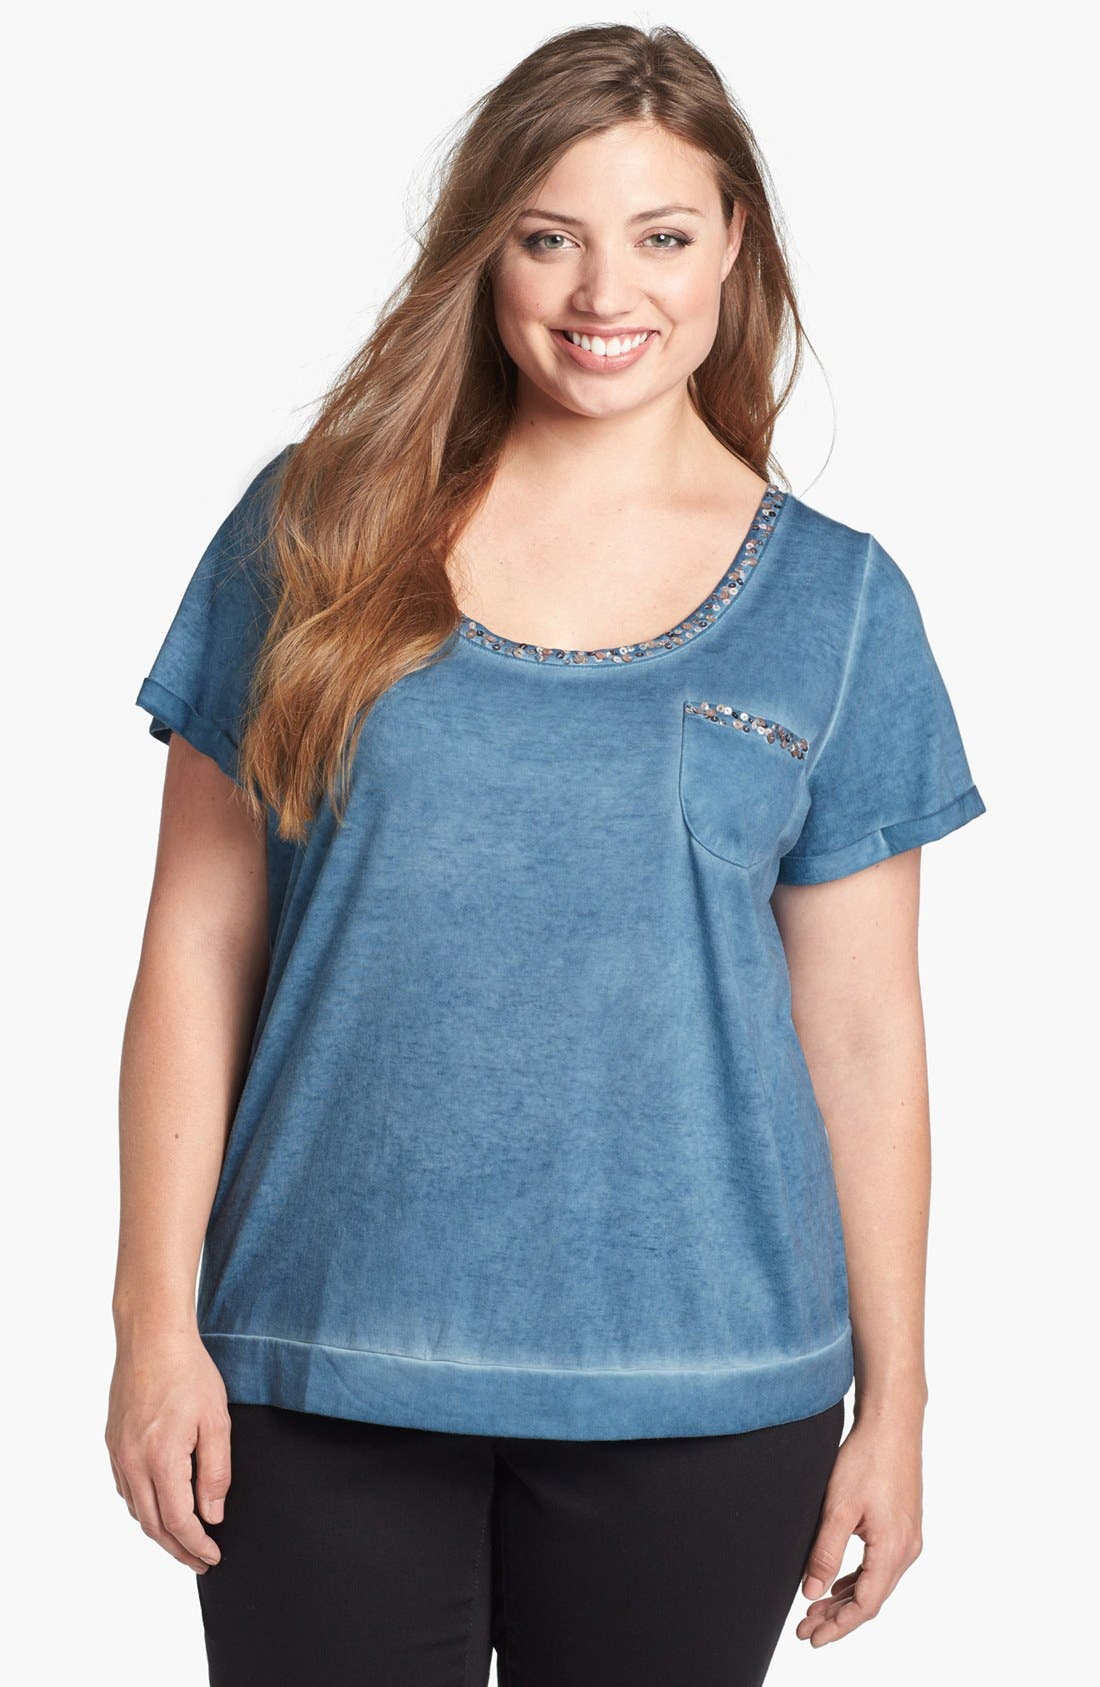 Alternate Image 1 Selected - Jessica Simpson 'Mona' Embellished Tee (Plus Size)